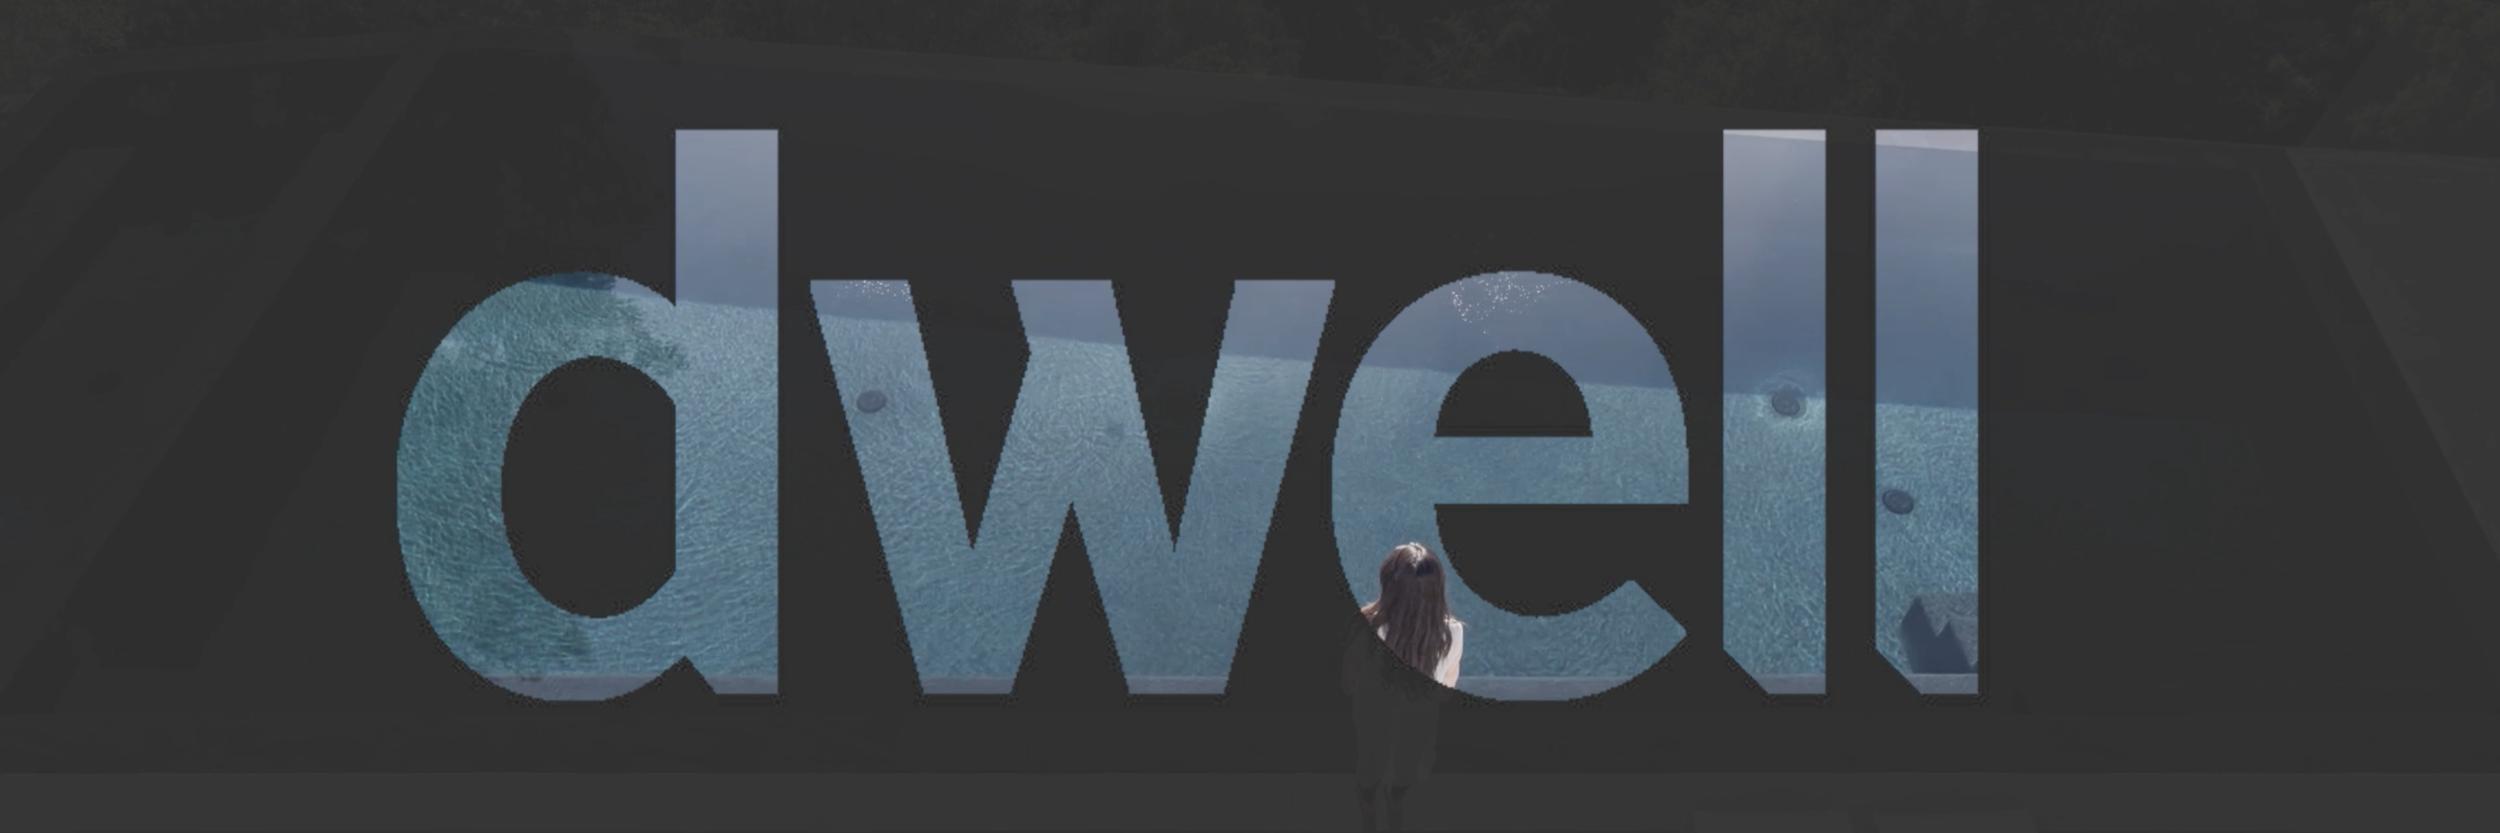 Dwell - ELL